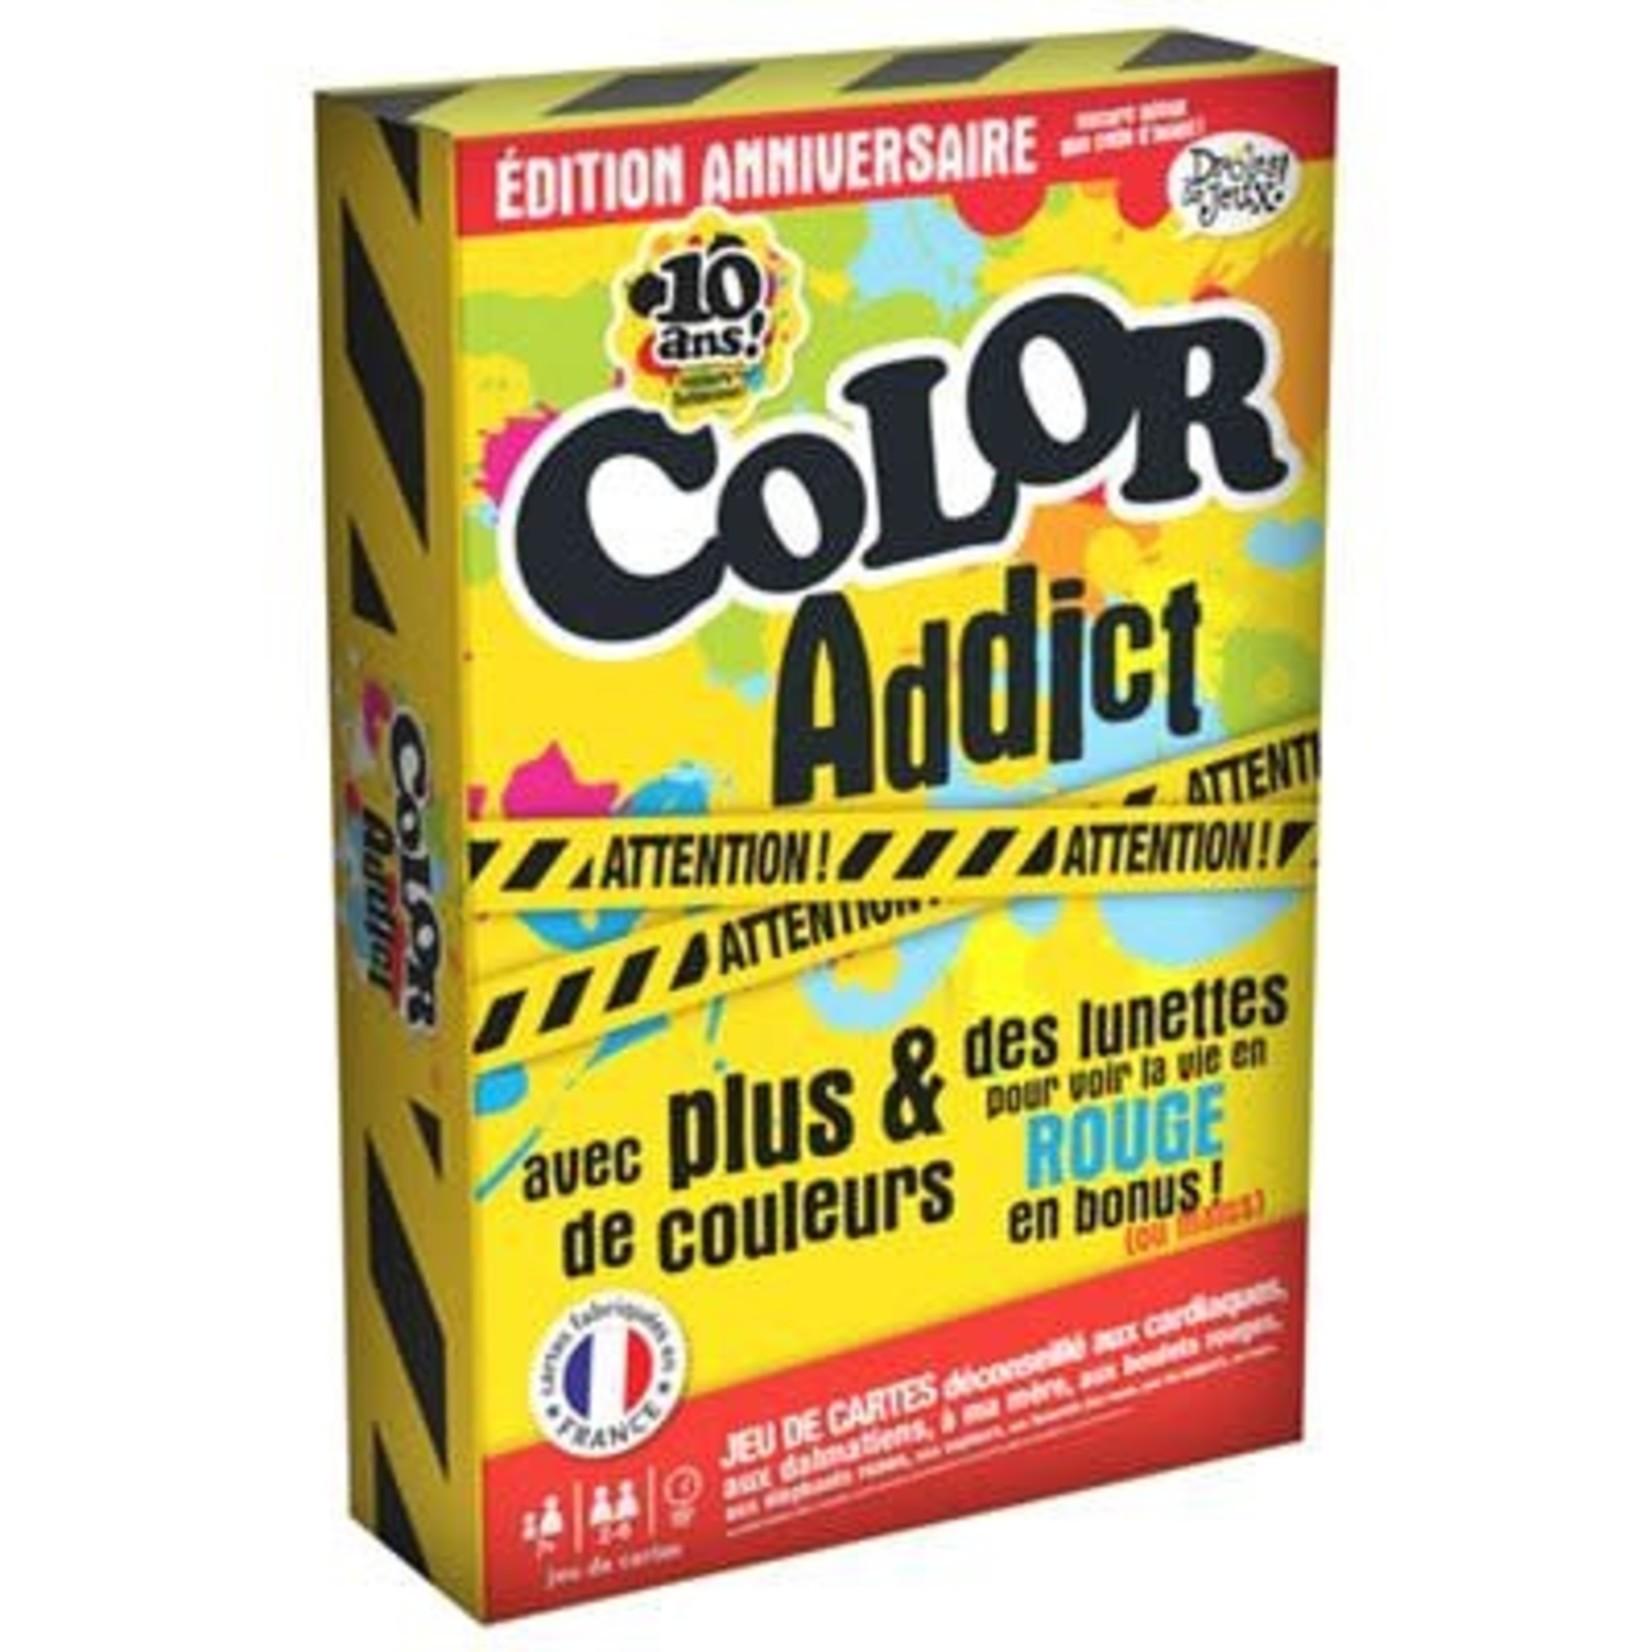 France Cartes Color Addict edition limitee 10 ans